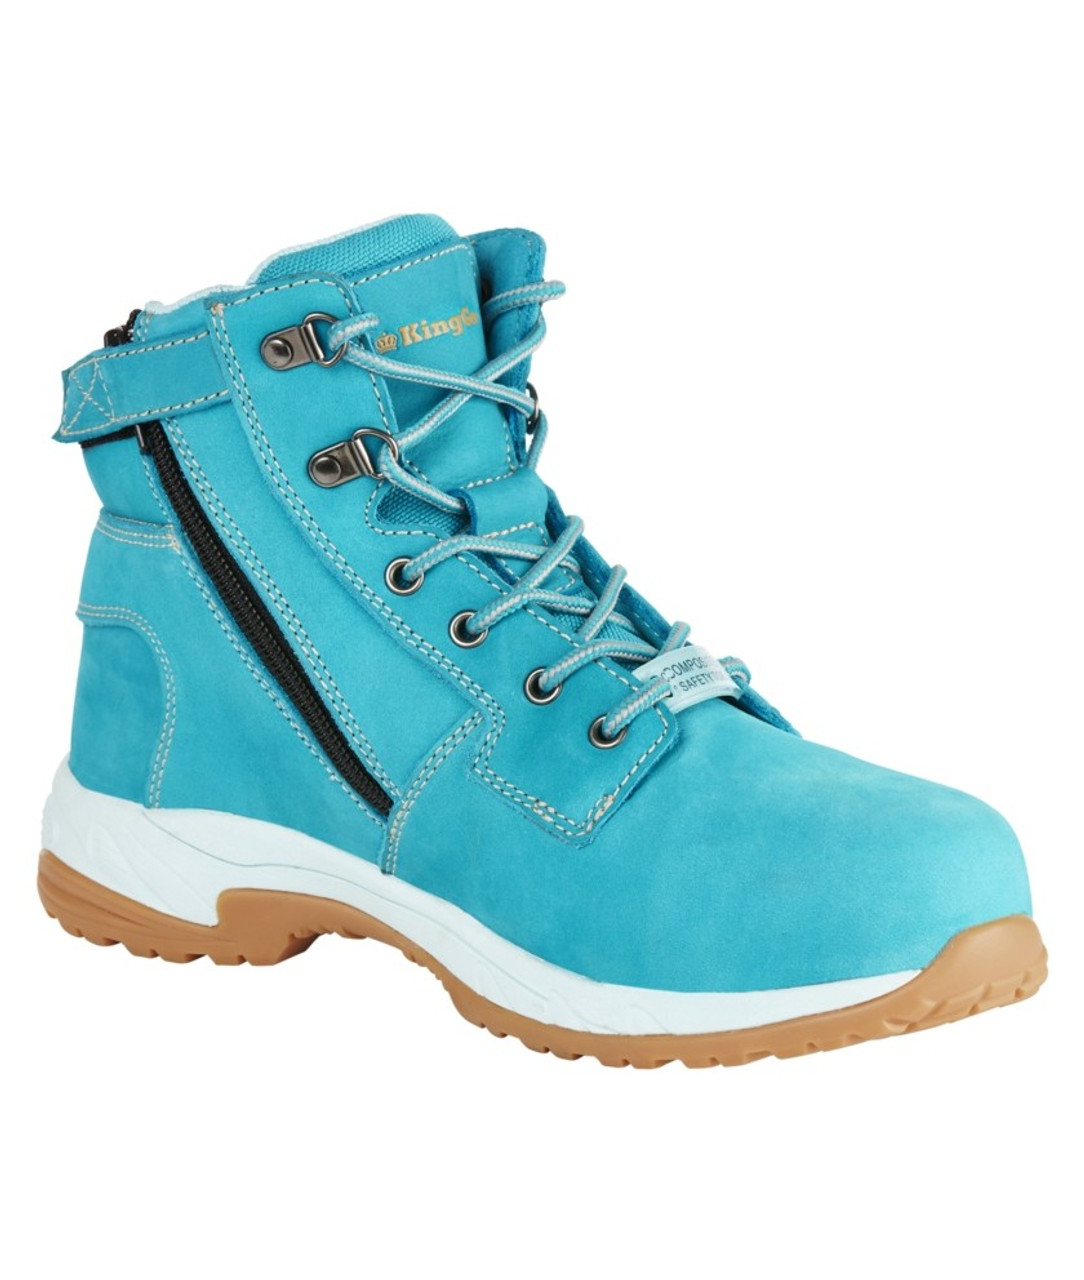 aeb5fb4318c KingGee Women's Tradie Zip Safety Work Boots in Teal Full Grain ...